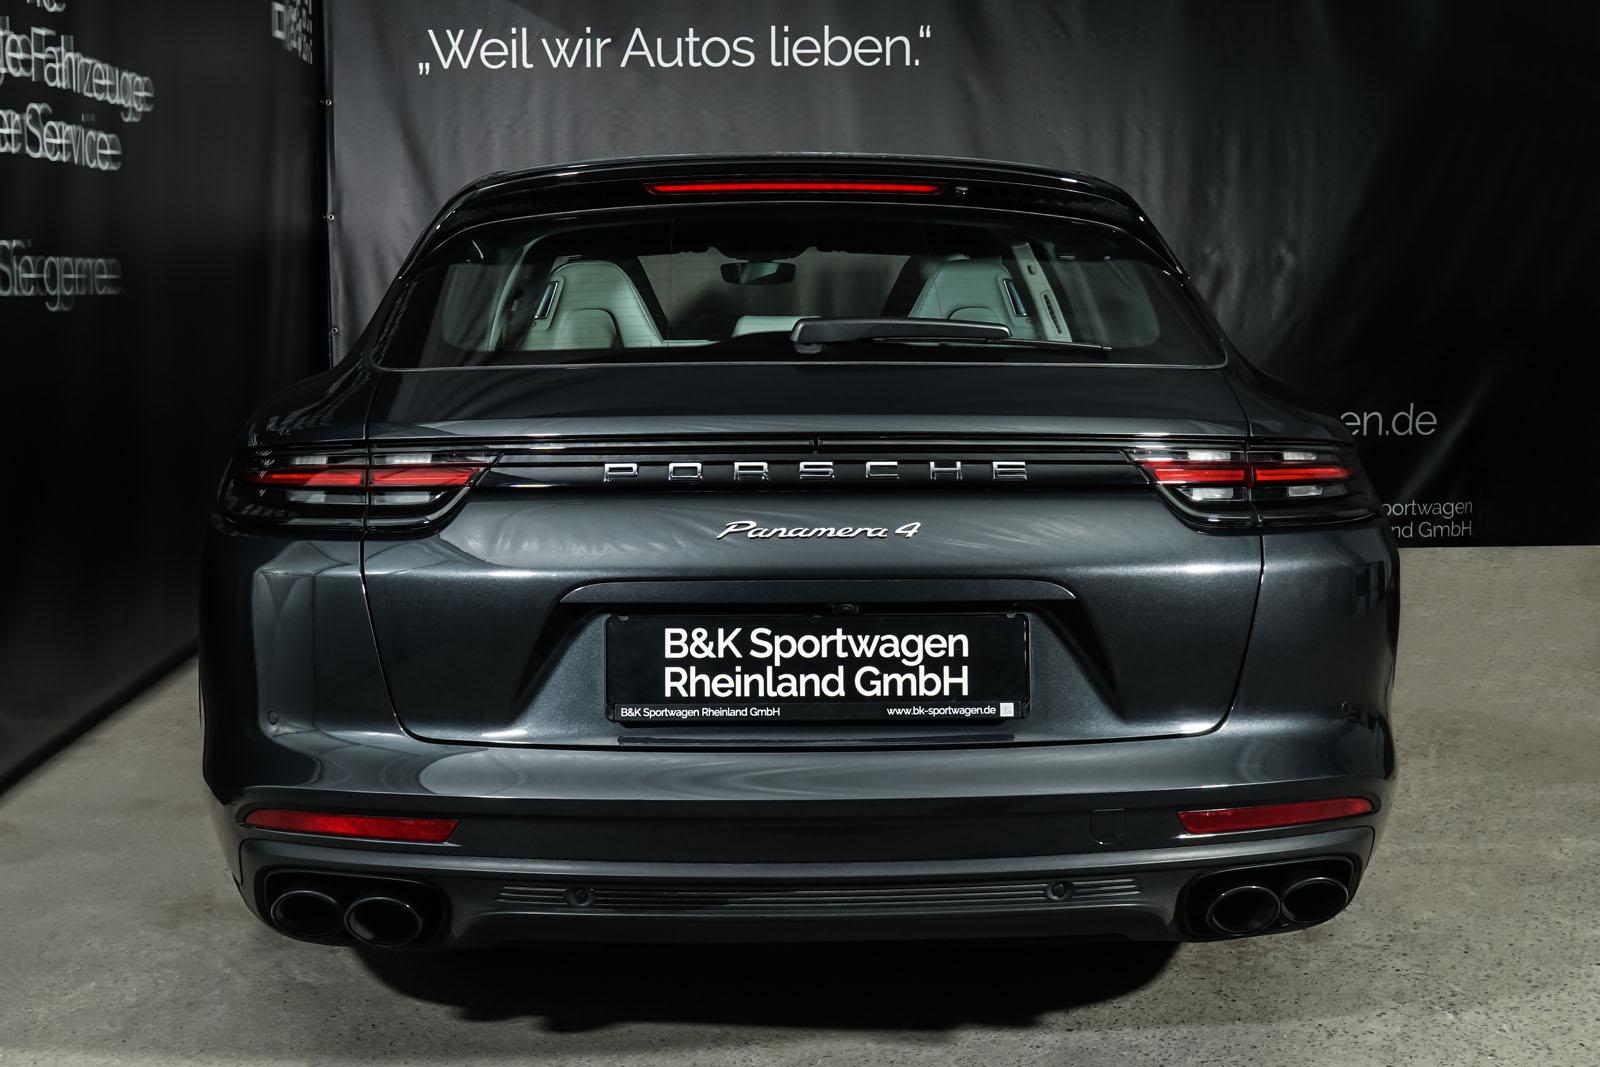 Porsche_Panamera4_SportTurismo_Grau_Weißgrau_POR-0979_15_w